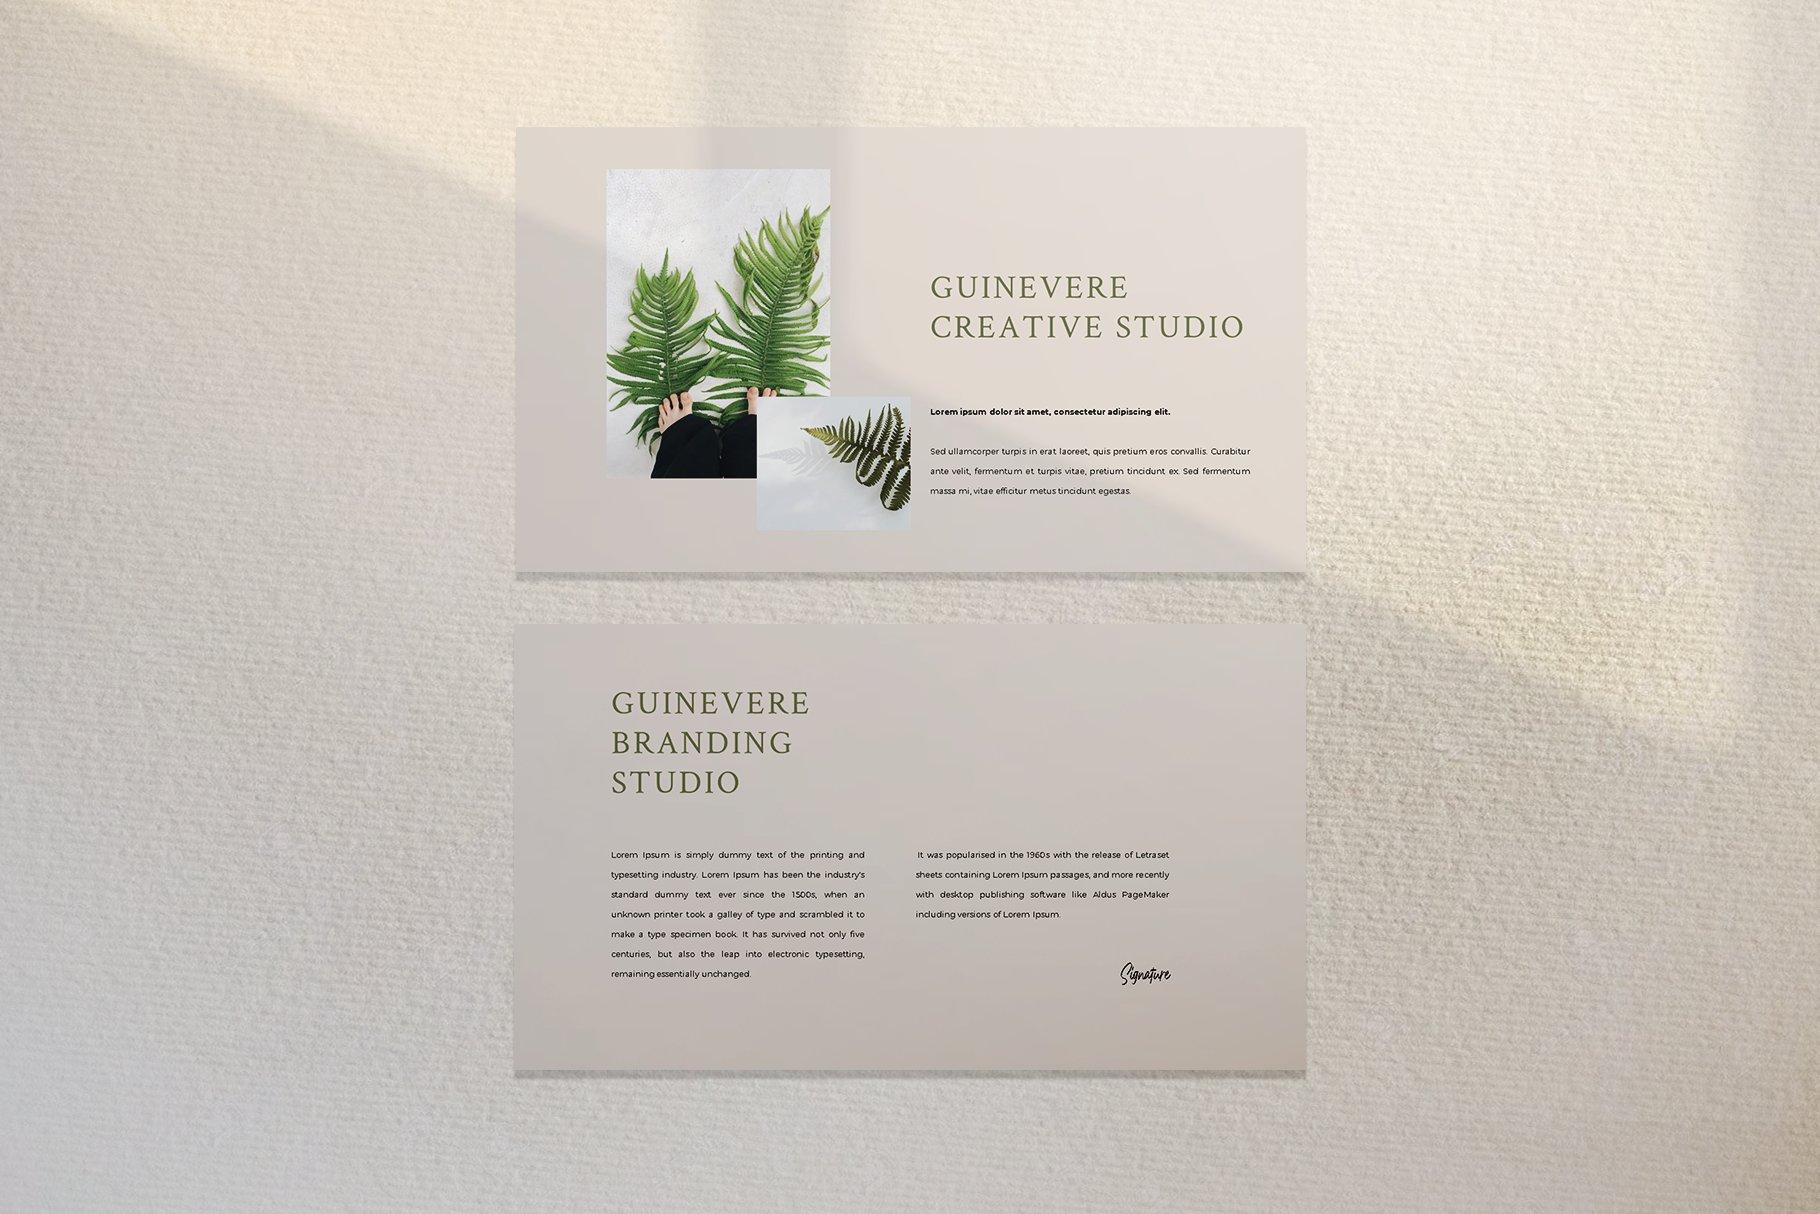 时尚品牌摄影作品集营销PPT幻灯片设计模板 Guinevere Presentation Template插图(9)